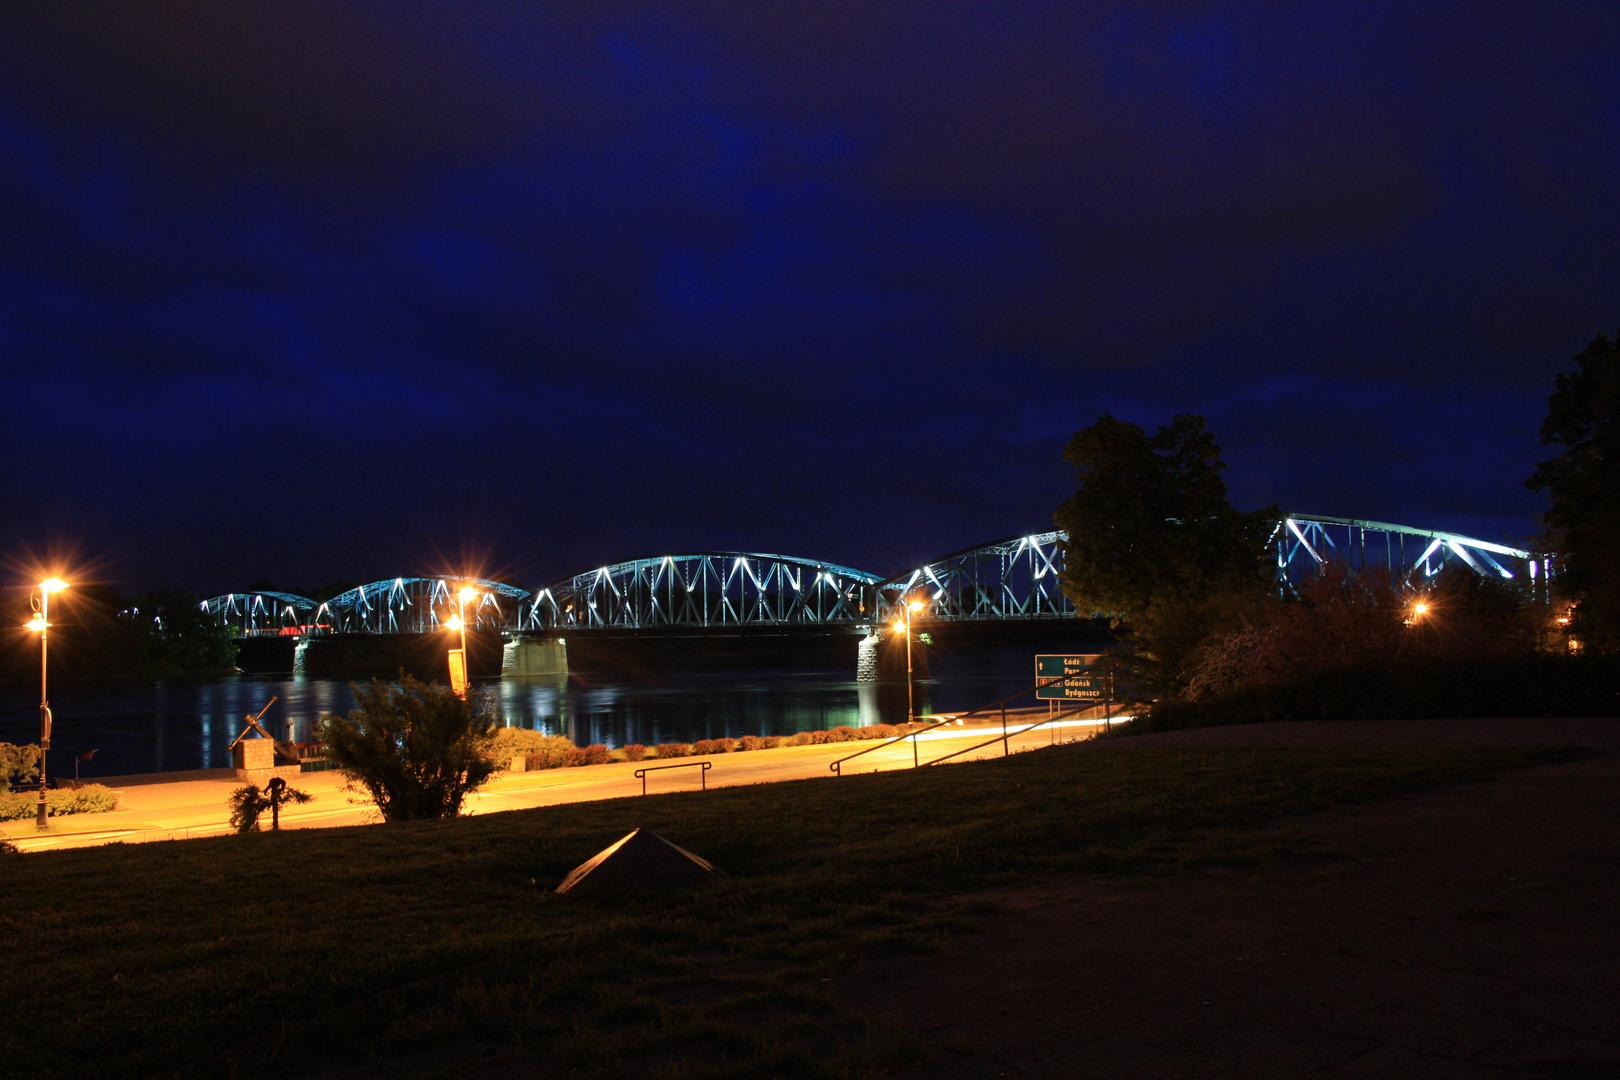 Nacht in Torun